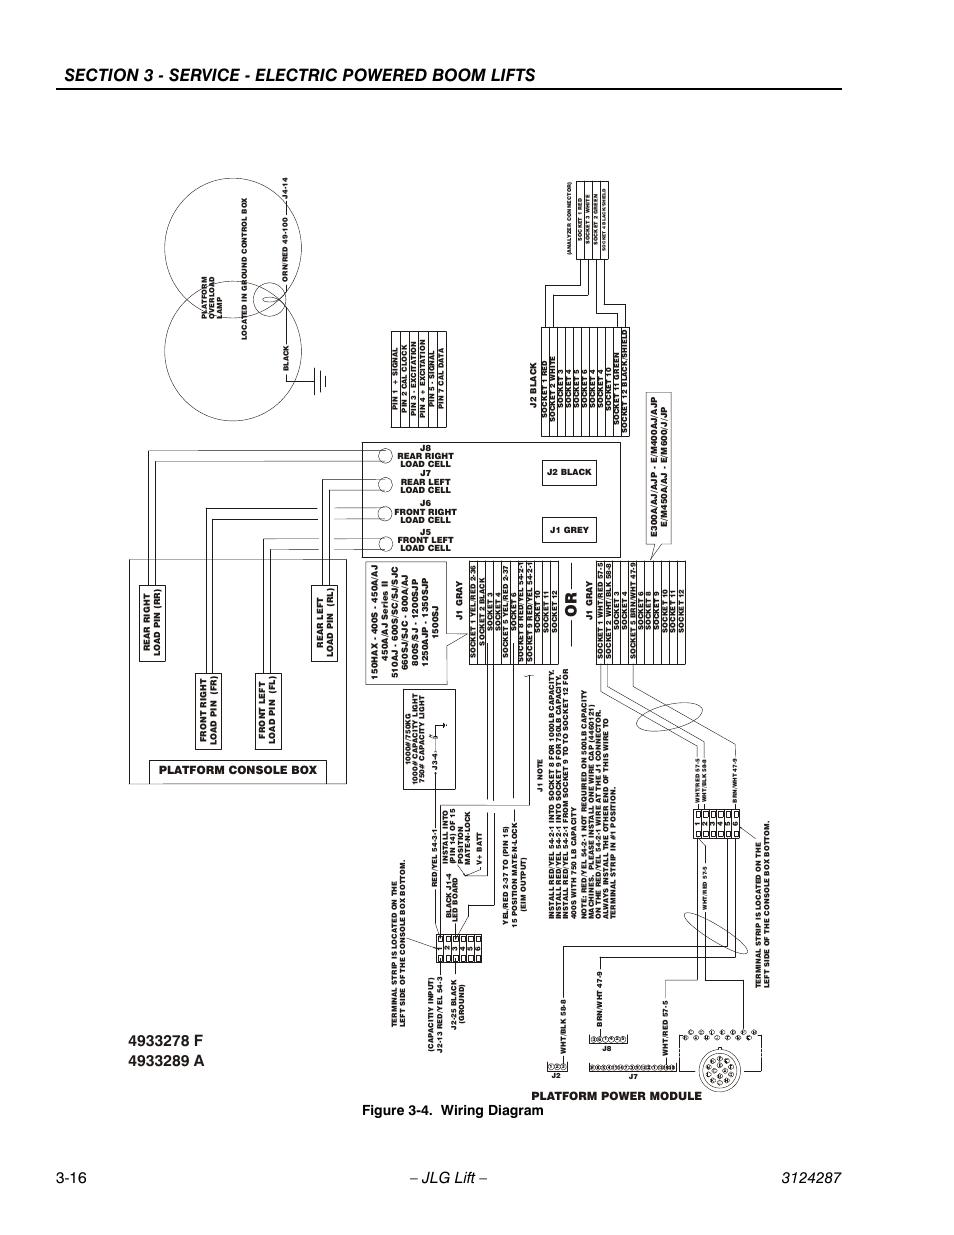 medium resolution of jlg wiring diagram wiring libraryjlg 40h wiring diagram 11